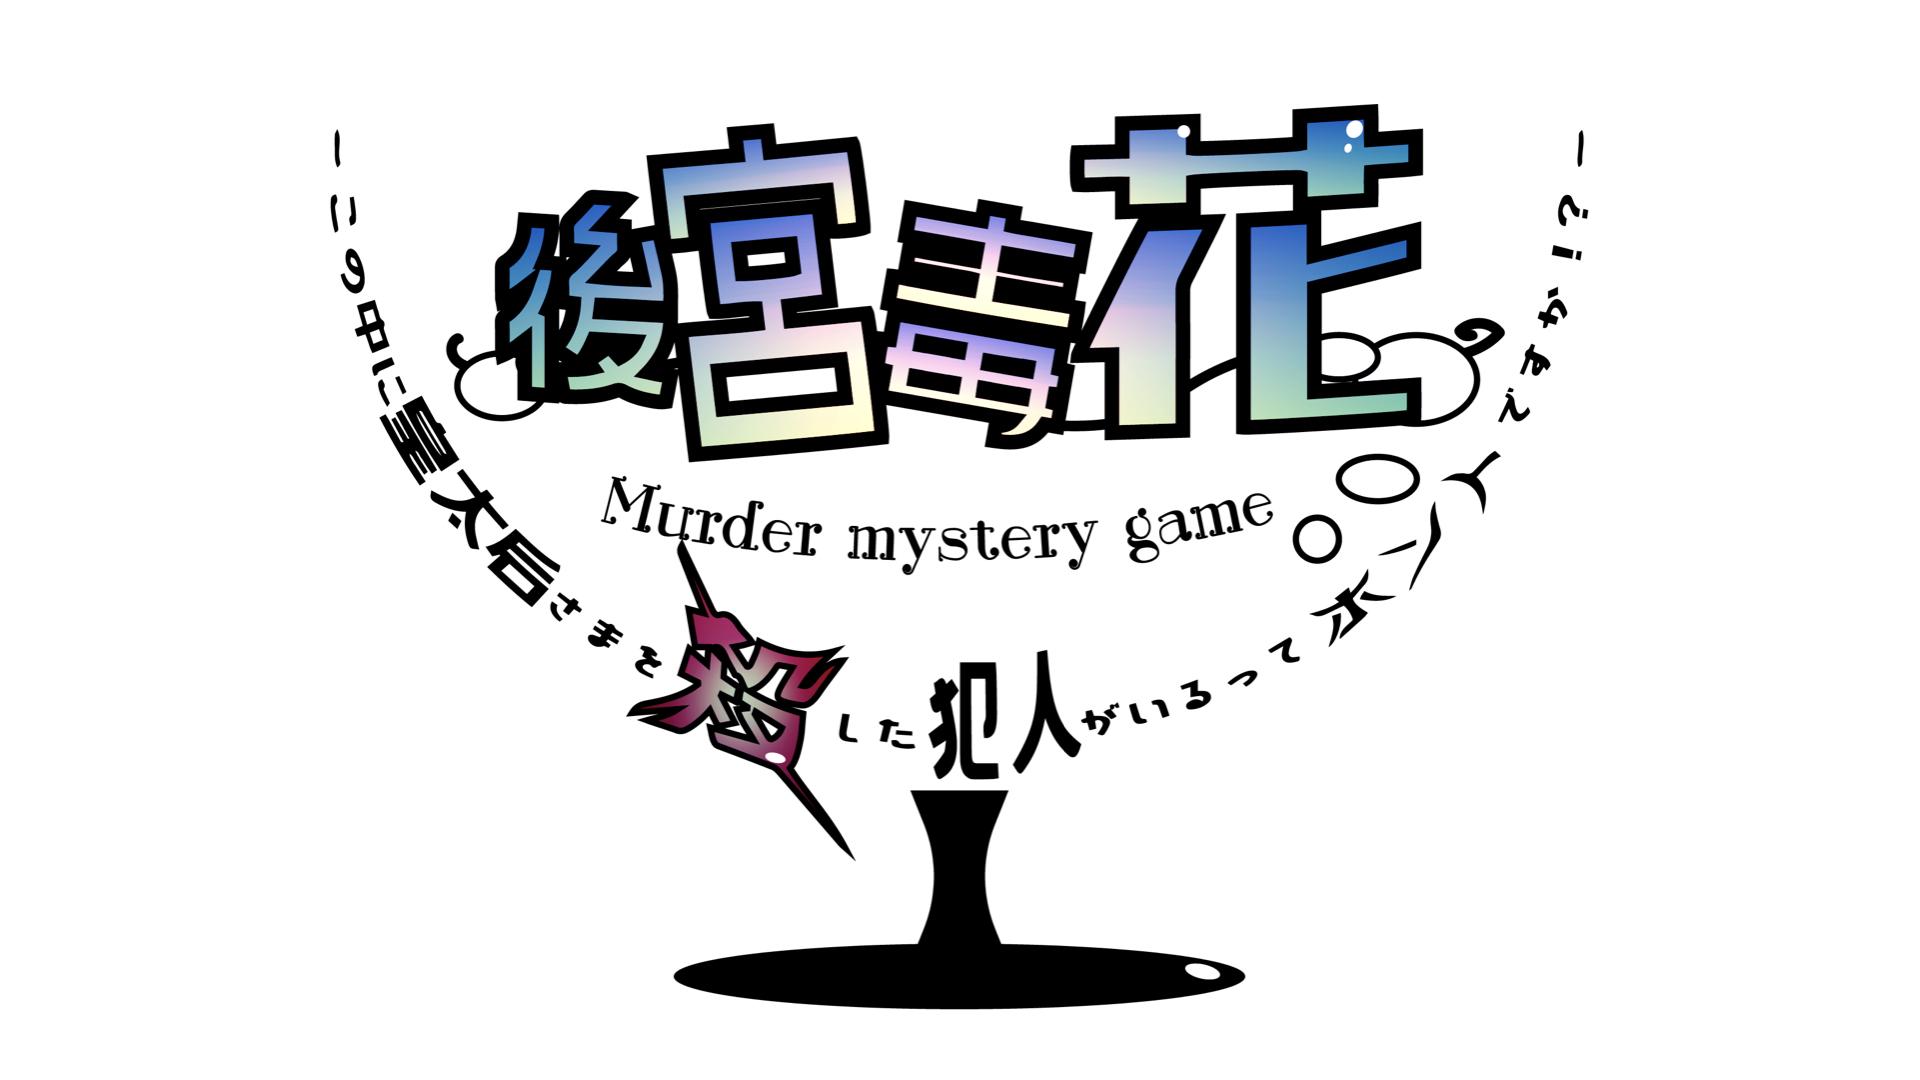 https://storage.googleapis.com/uzu_data/games/kokyu_dokka/cover390gje4.jpeg